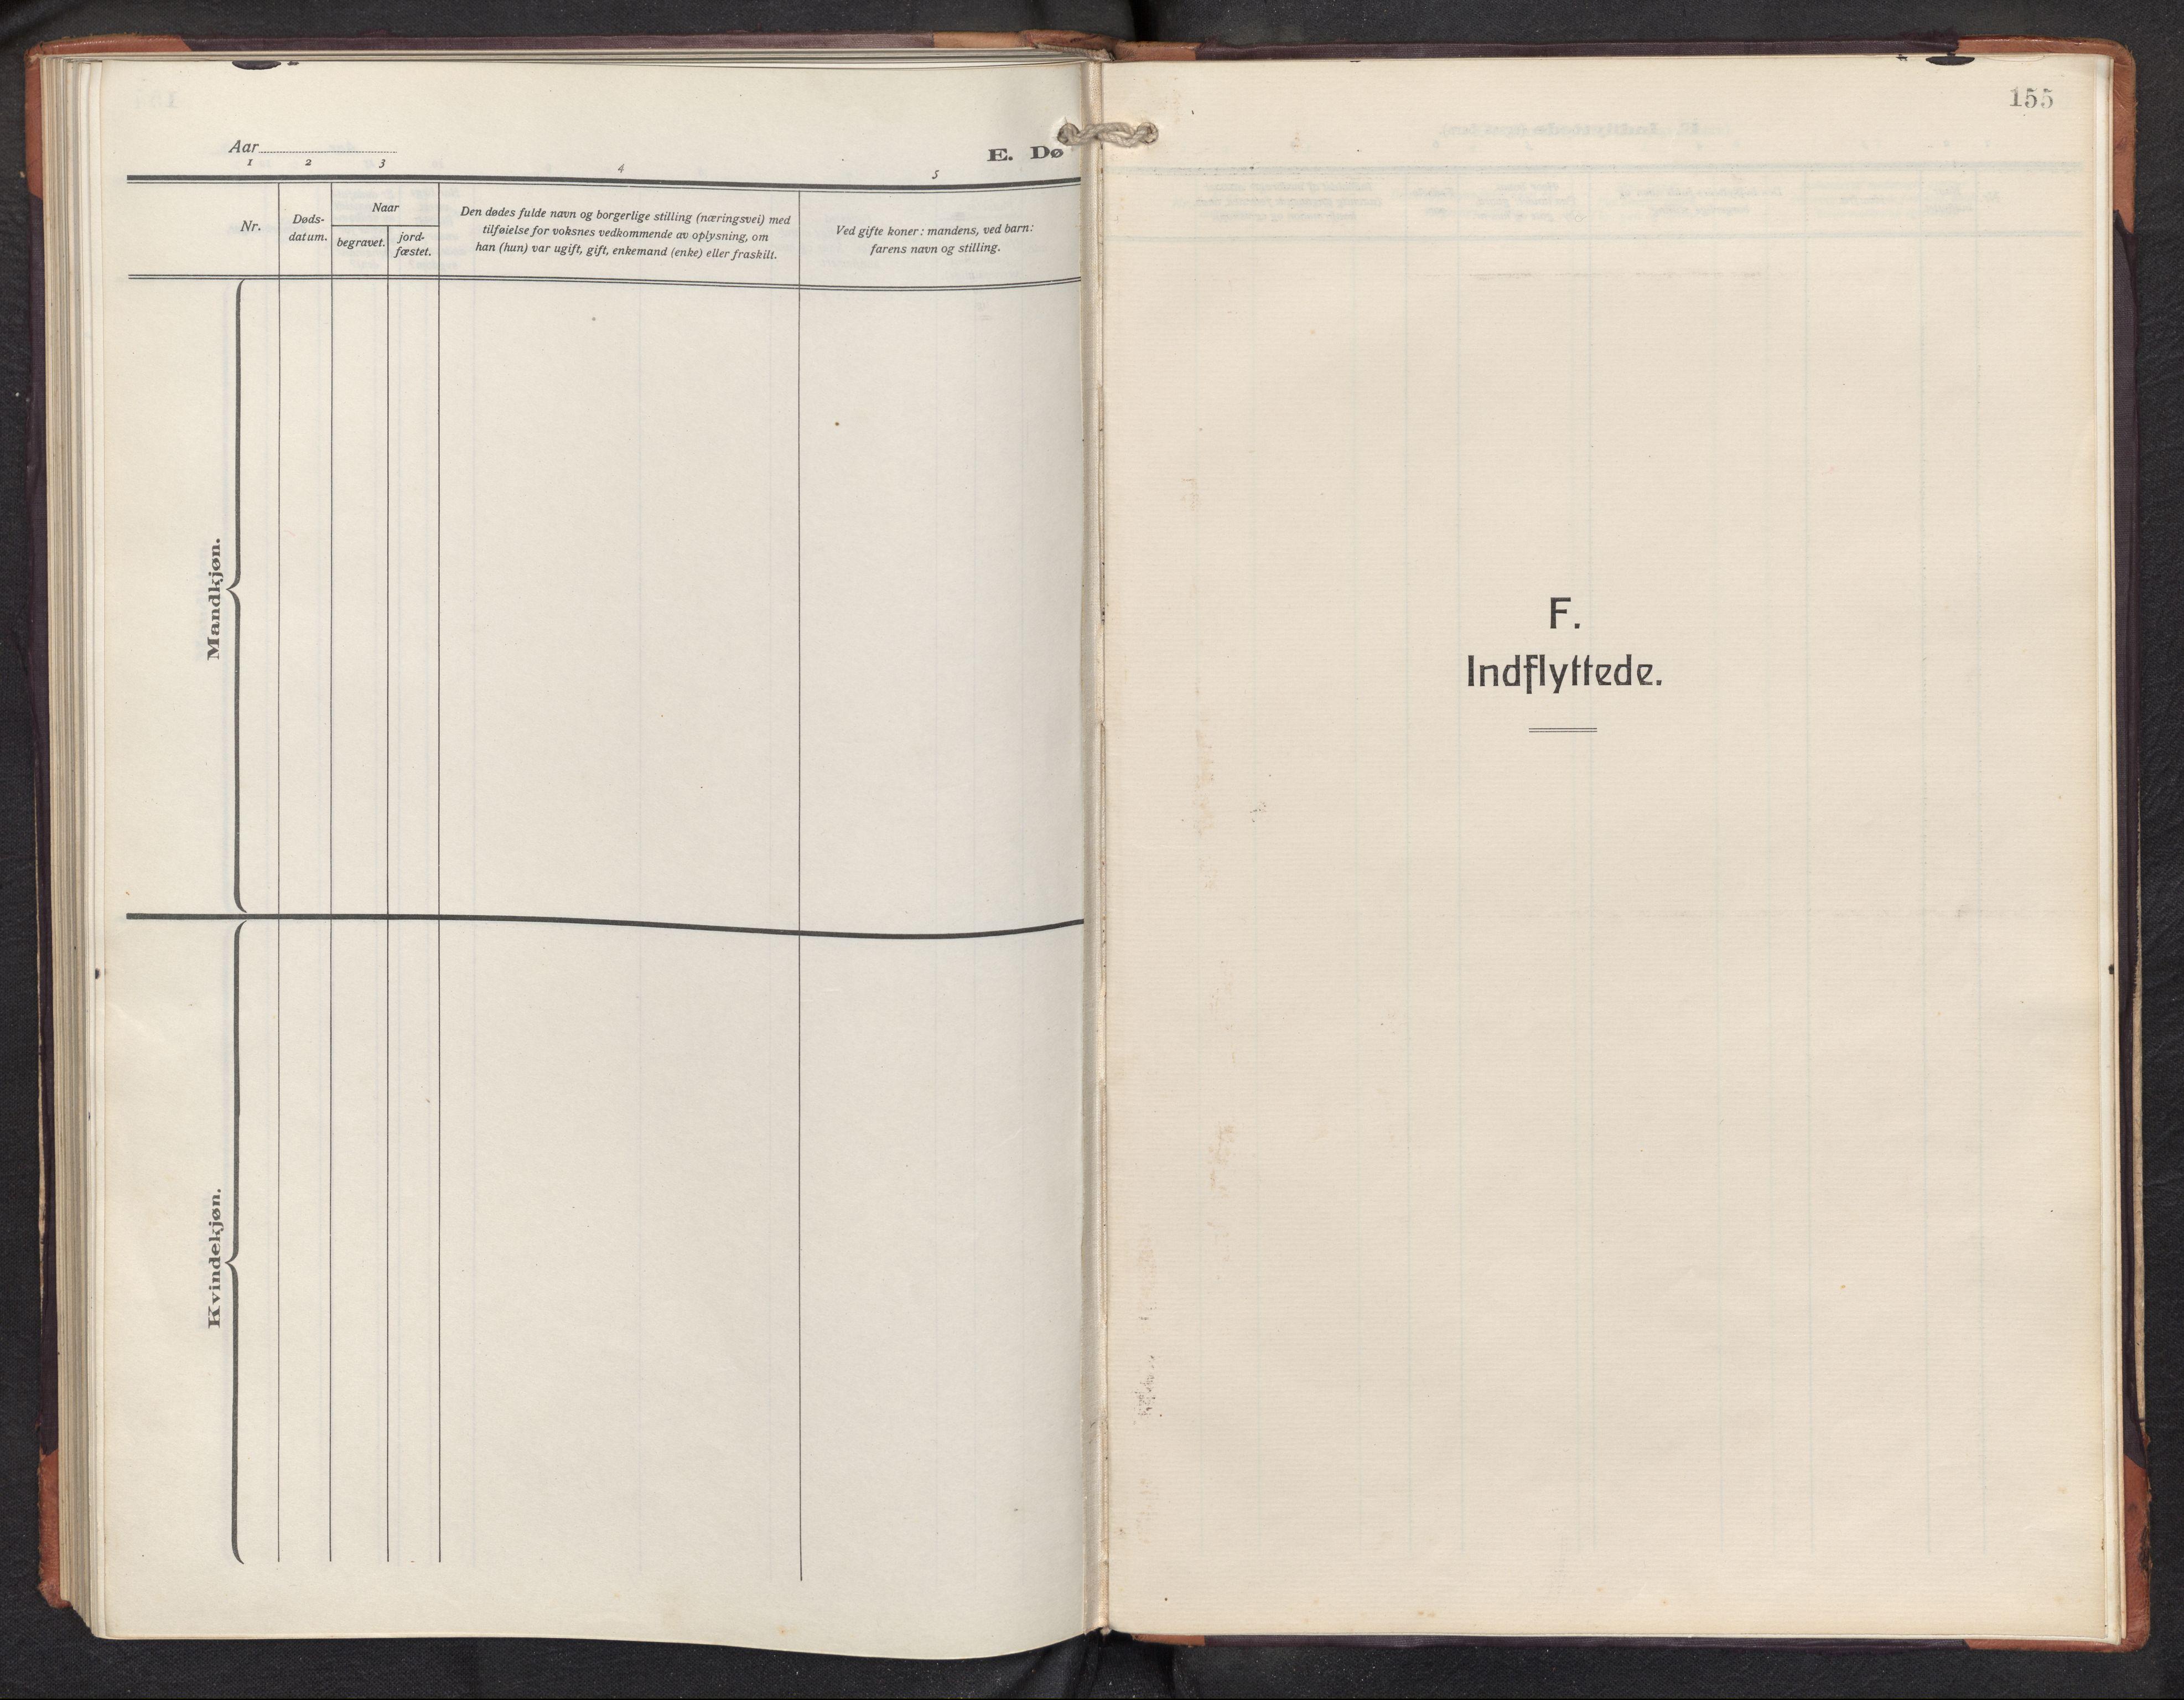 SAB, Aurland sokneprestembete, H/Hb/Hbd/L0003: Klokkerbok nr. D 3, 1920-1968, s. 154b-155a